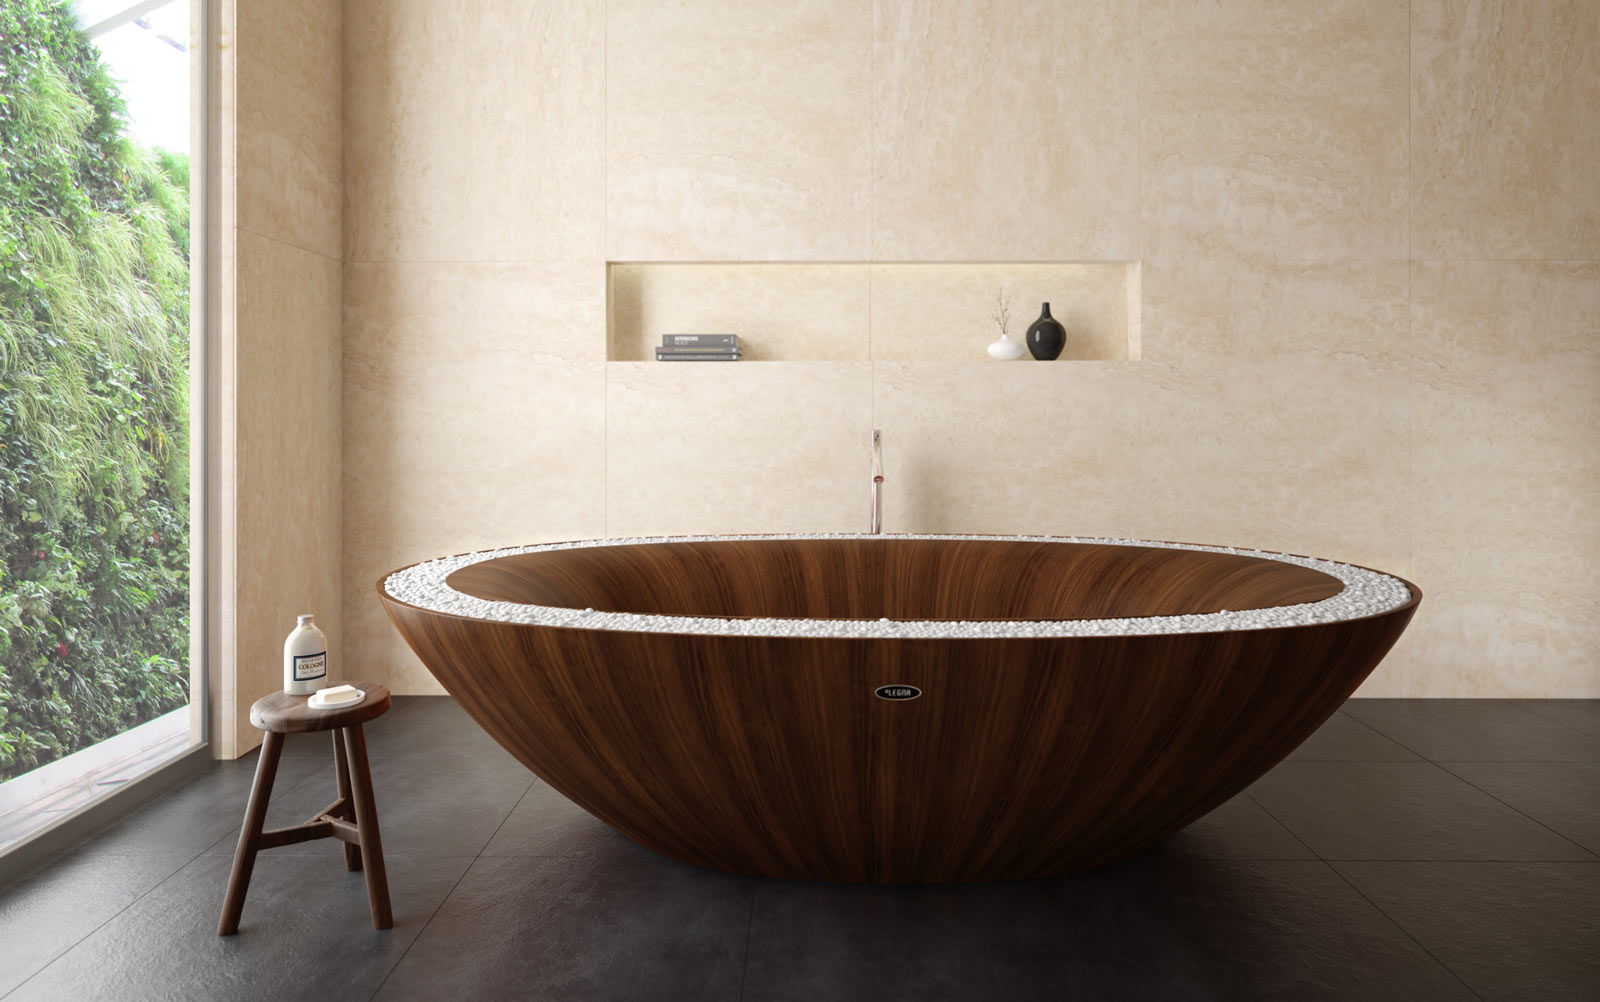 Modernes Design Trifft Naturbewusstsein: